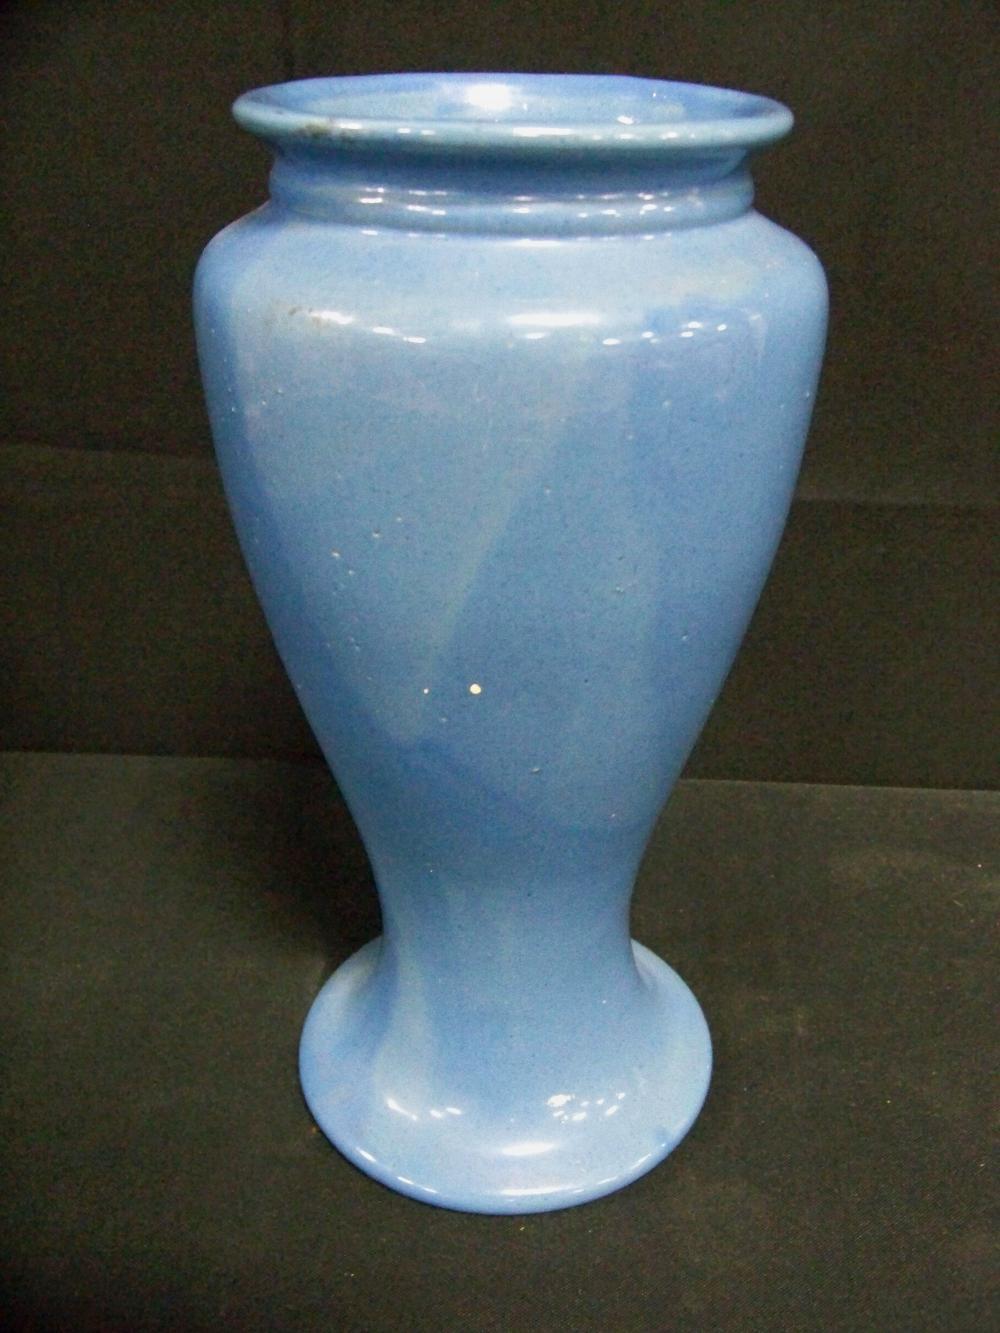 Vintage Selden Bybee Vase